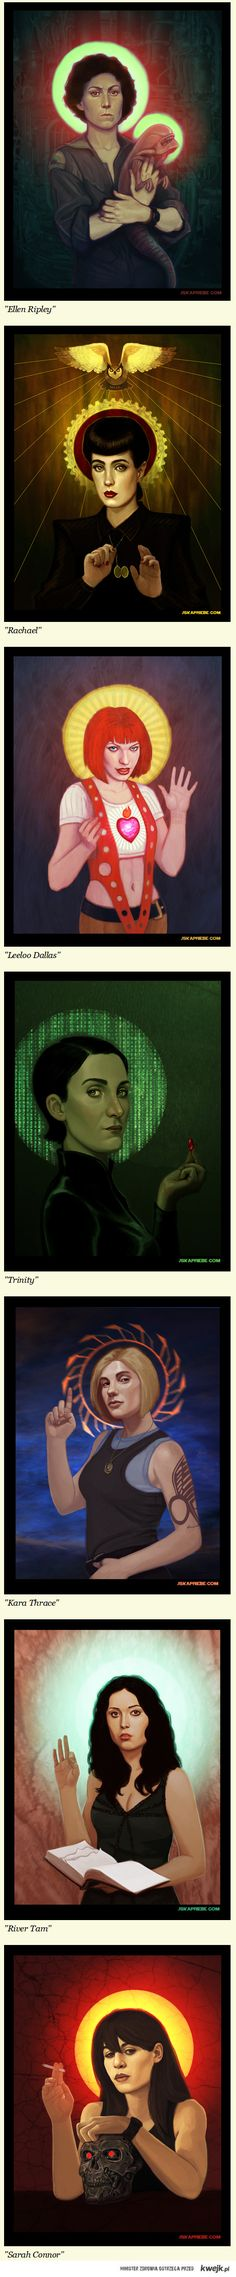 The female saints of Sci-fi by Jska Priebe #scifiladies